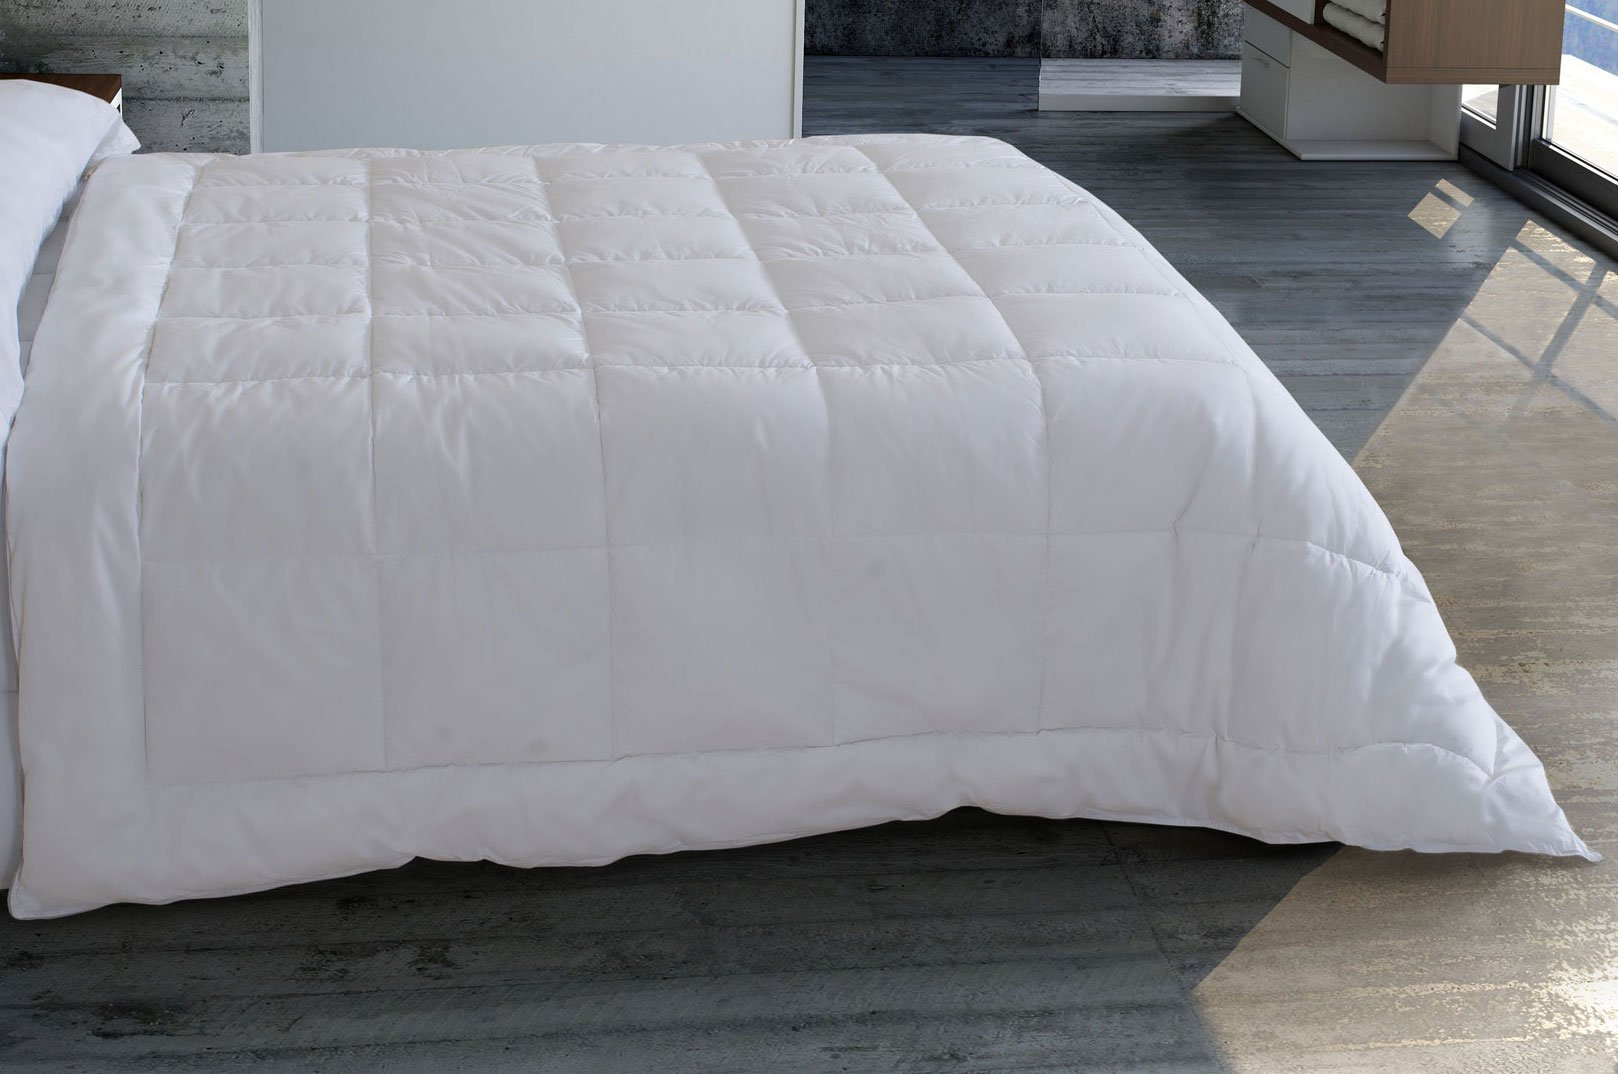 Algodón Blanco - Relleno Microfibra 400gr Transpirable Blanco 260X240: Amazon.es: Hogar